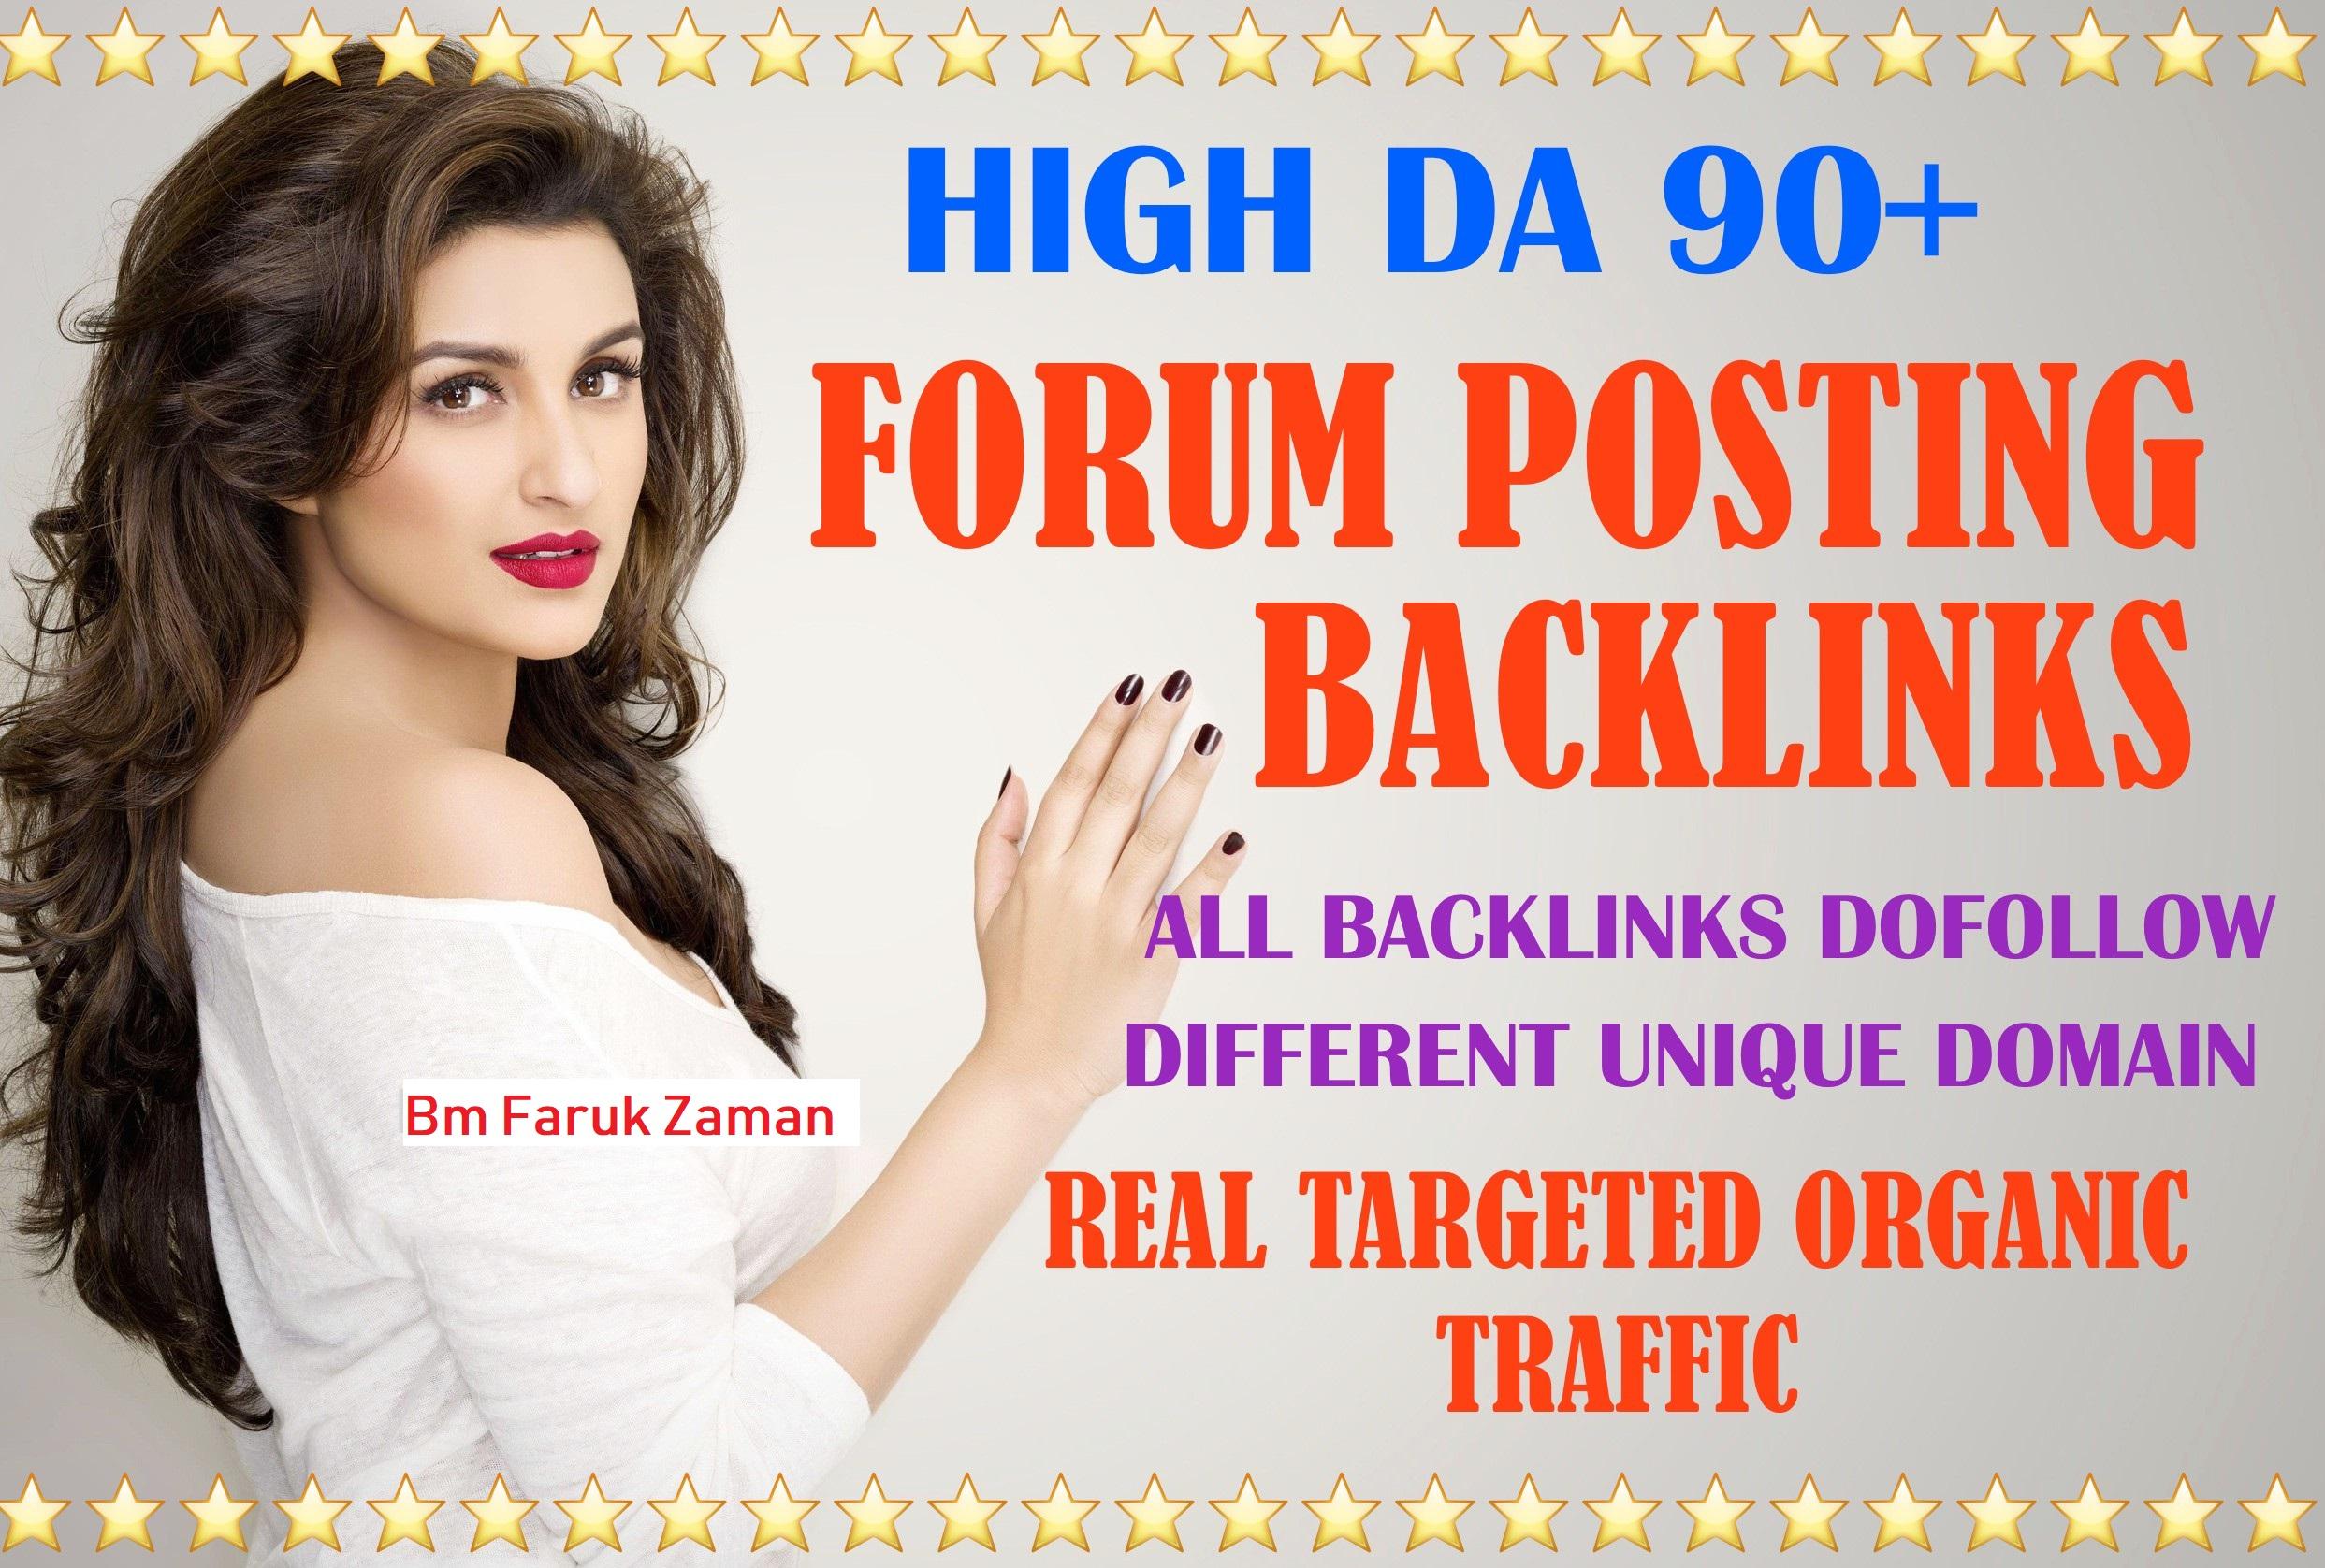 15 Niche related Forum Posting Backlinks. DA will be 50+